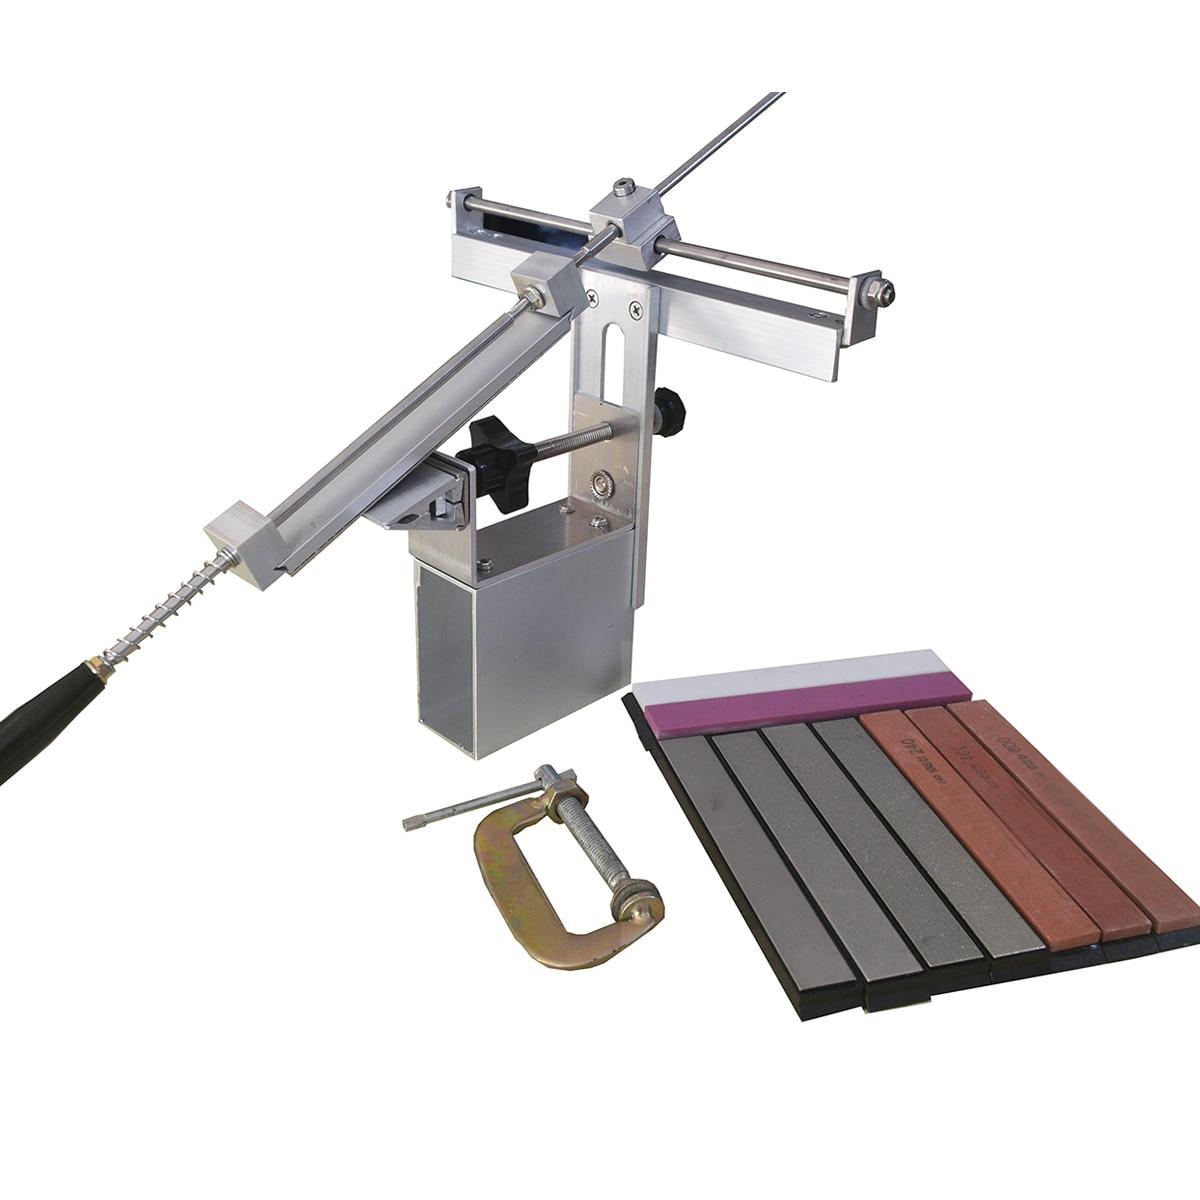 Afilador de cuchillos de cocina sistema de actualización profesional apex afilador cuchillo herramientas KME diamante